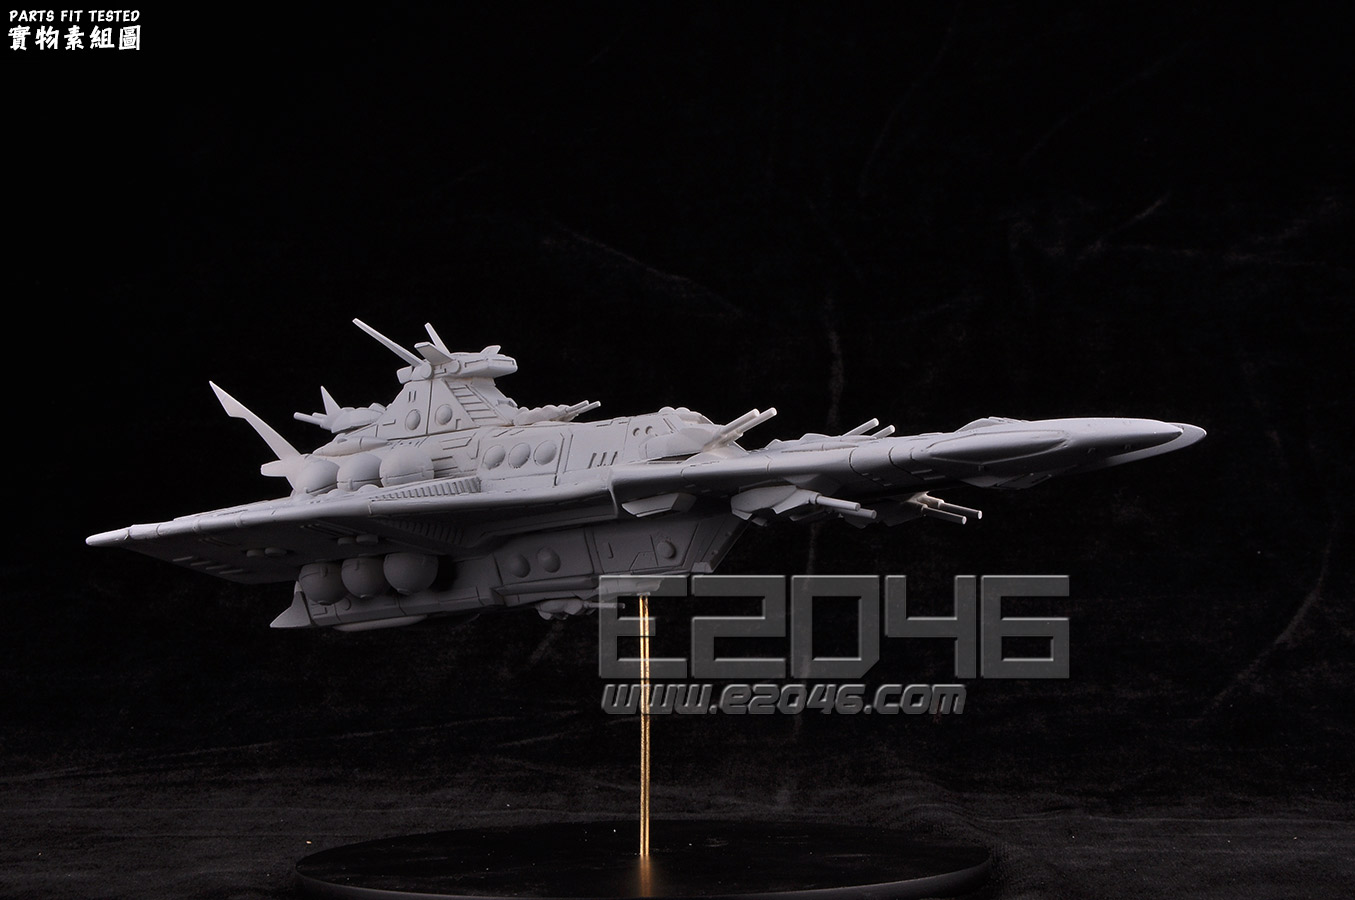 Rewloola-class Battleship